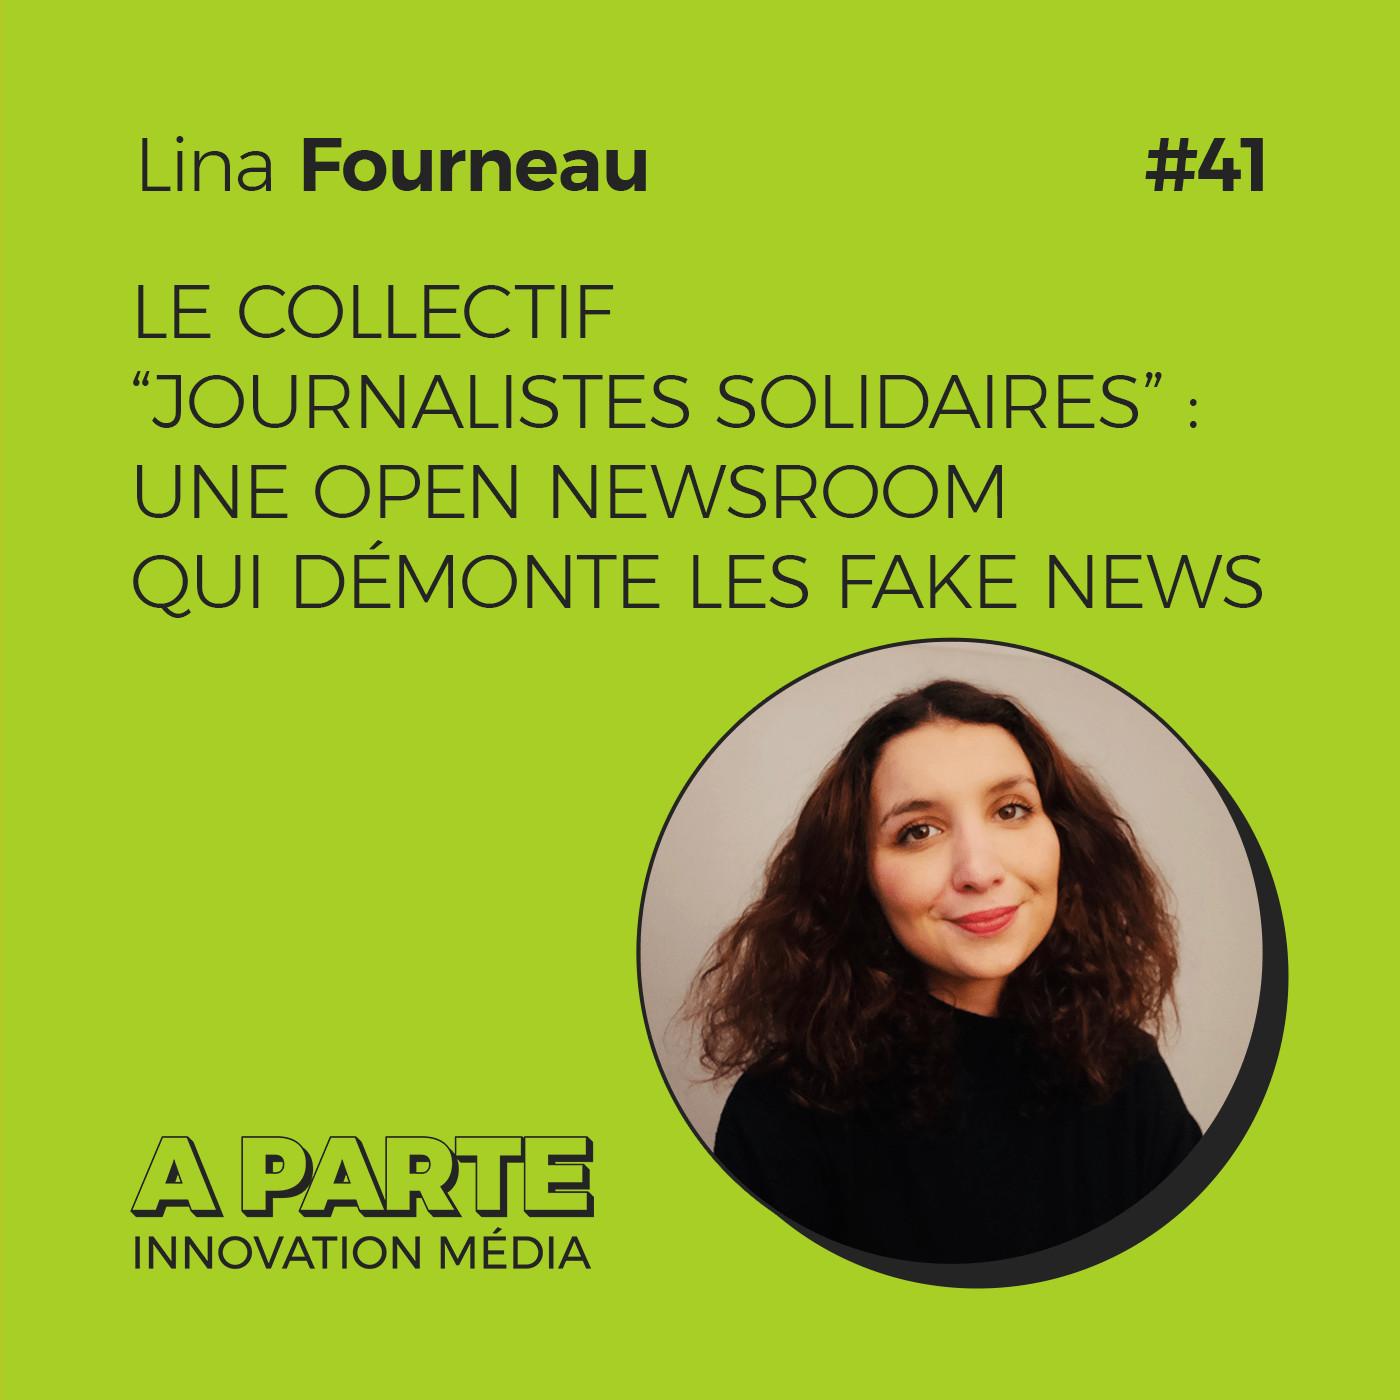 "Le collectif ""journalistes solidaires"" : une open newsroom qui démonte les fake news, avec Lina Fourneau"